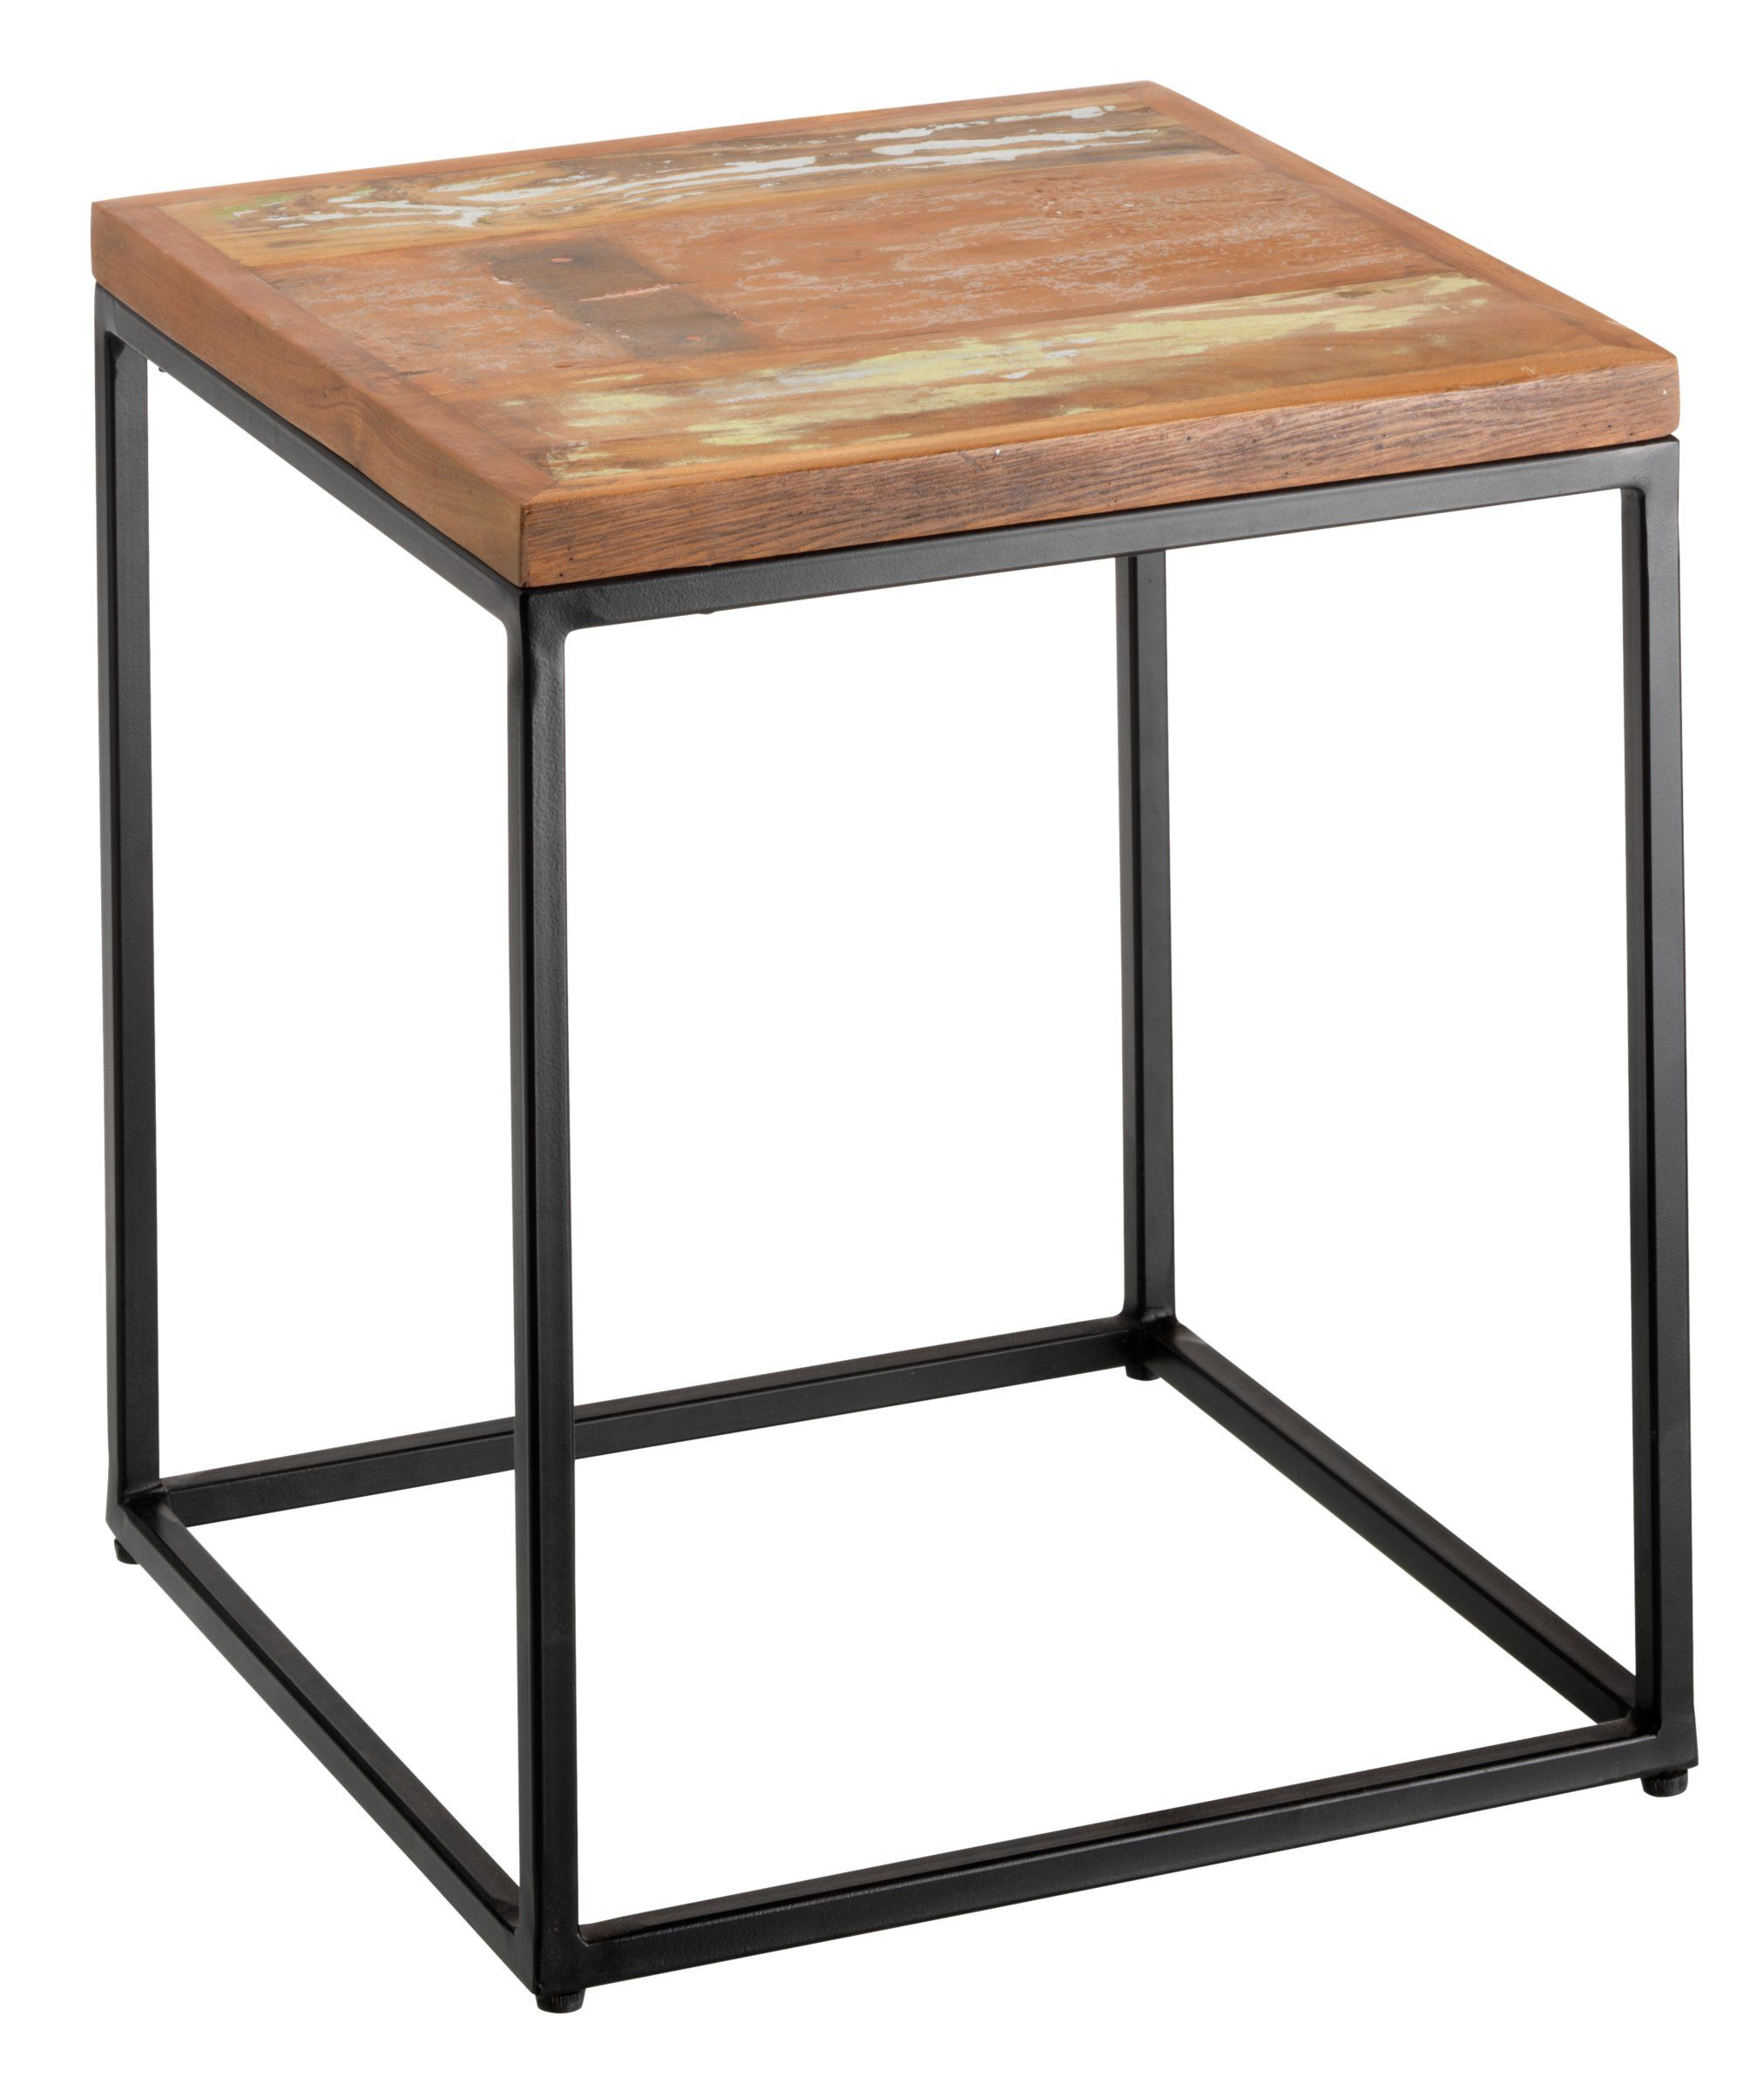 beistelltisch ronan platte recyceltes mangoholz massiv farbig lackiert gestell metall. Black Bedroom Furniture Sets. Home Design Ideas